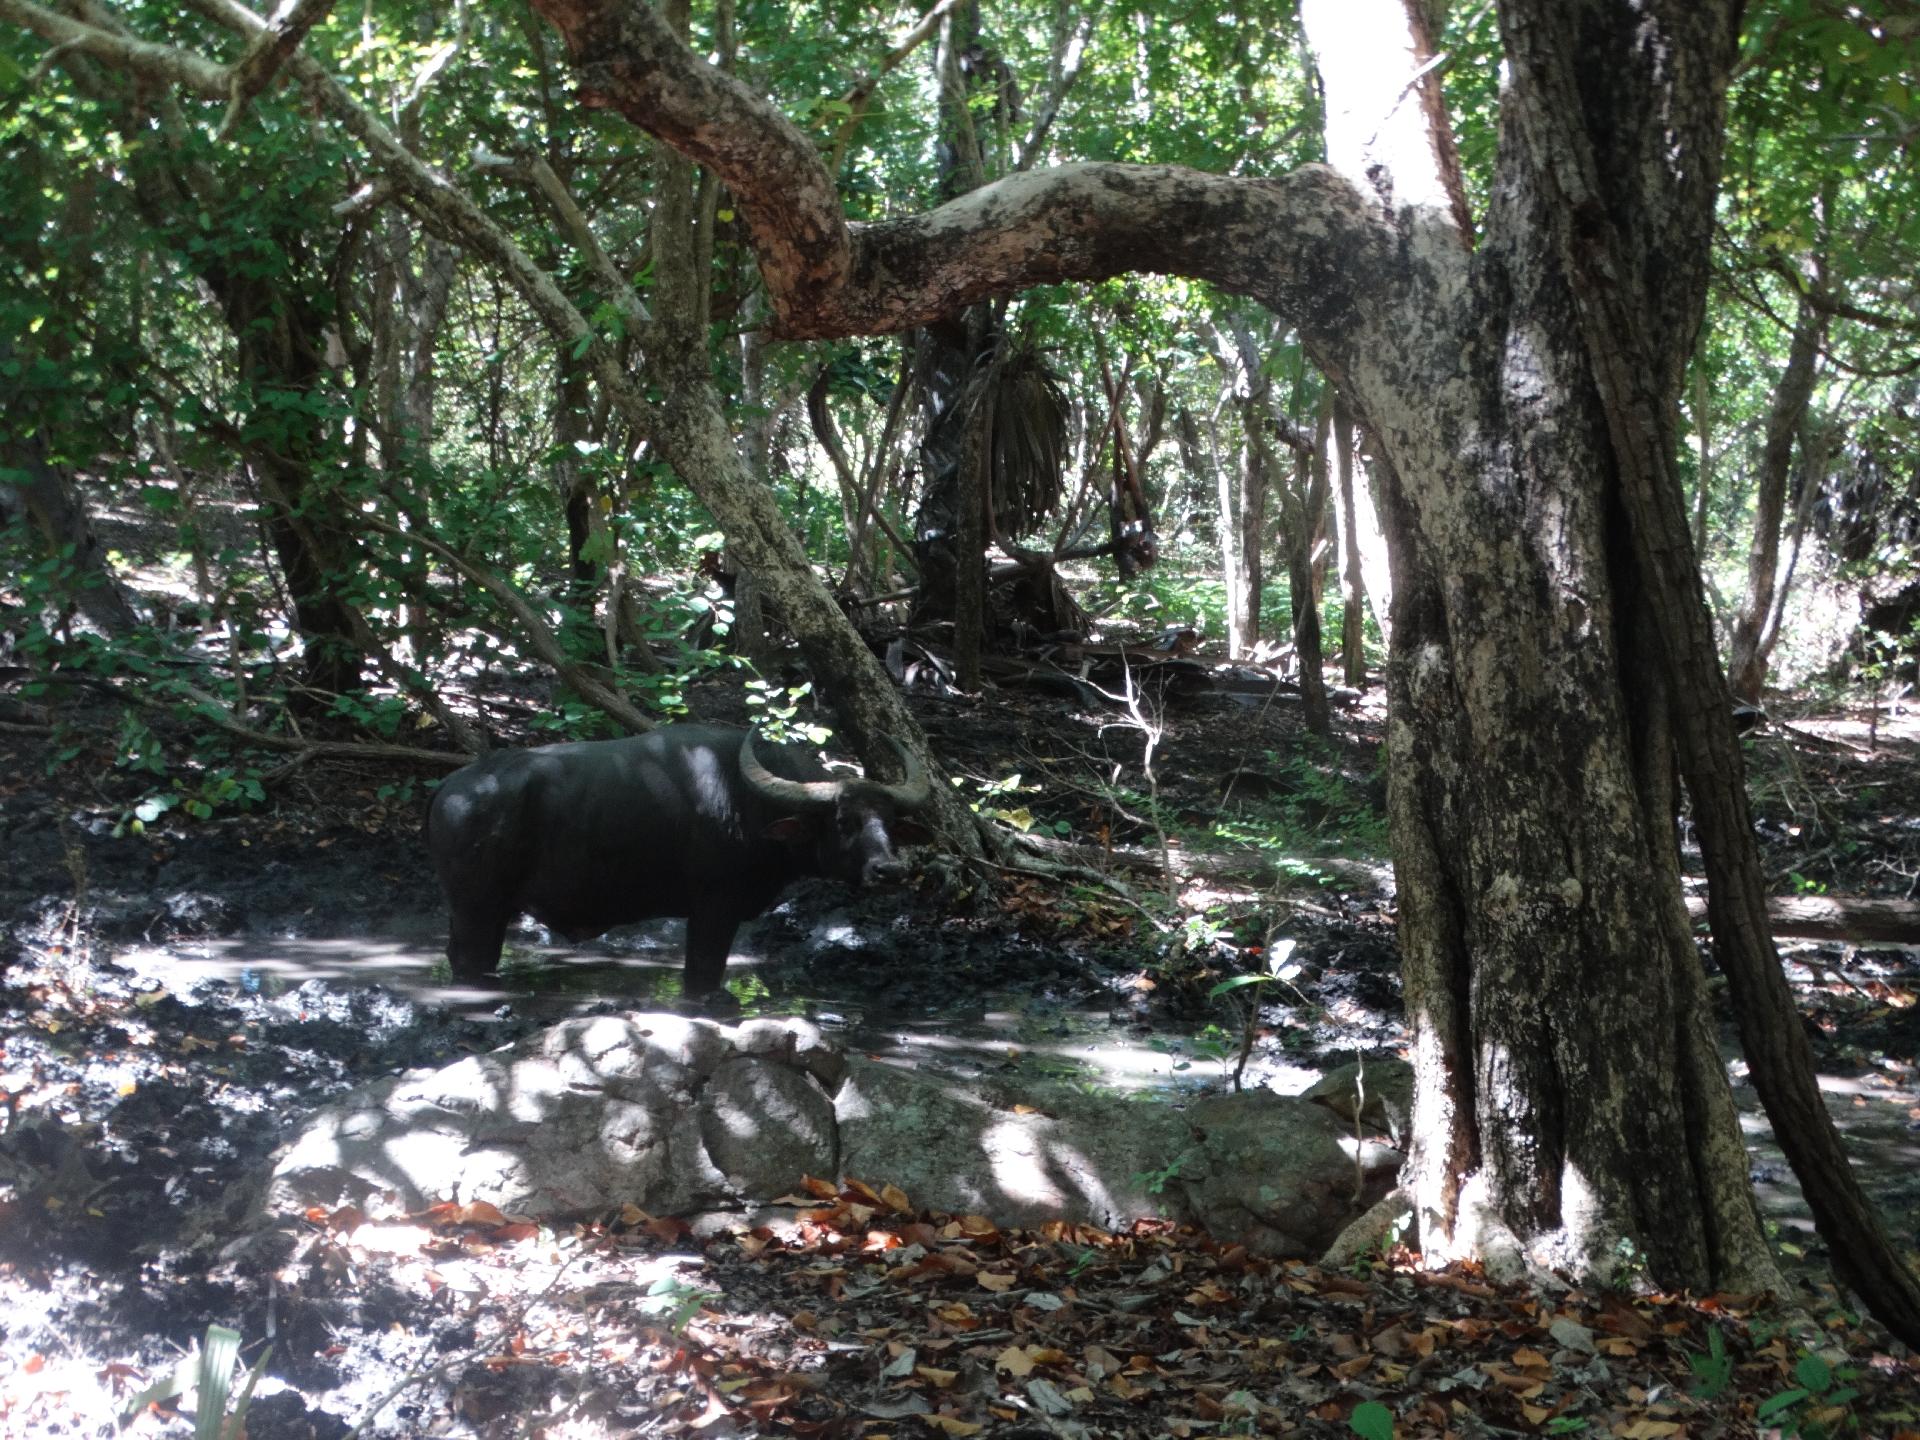 Dziki bawół (Rinca)